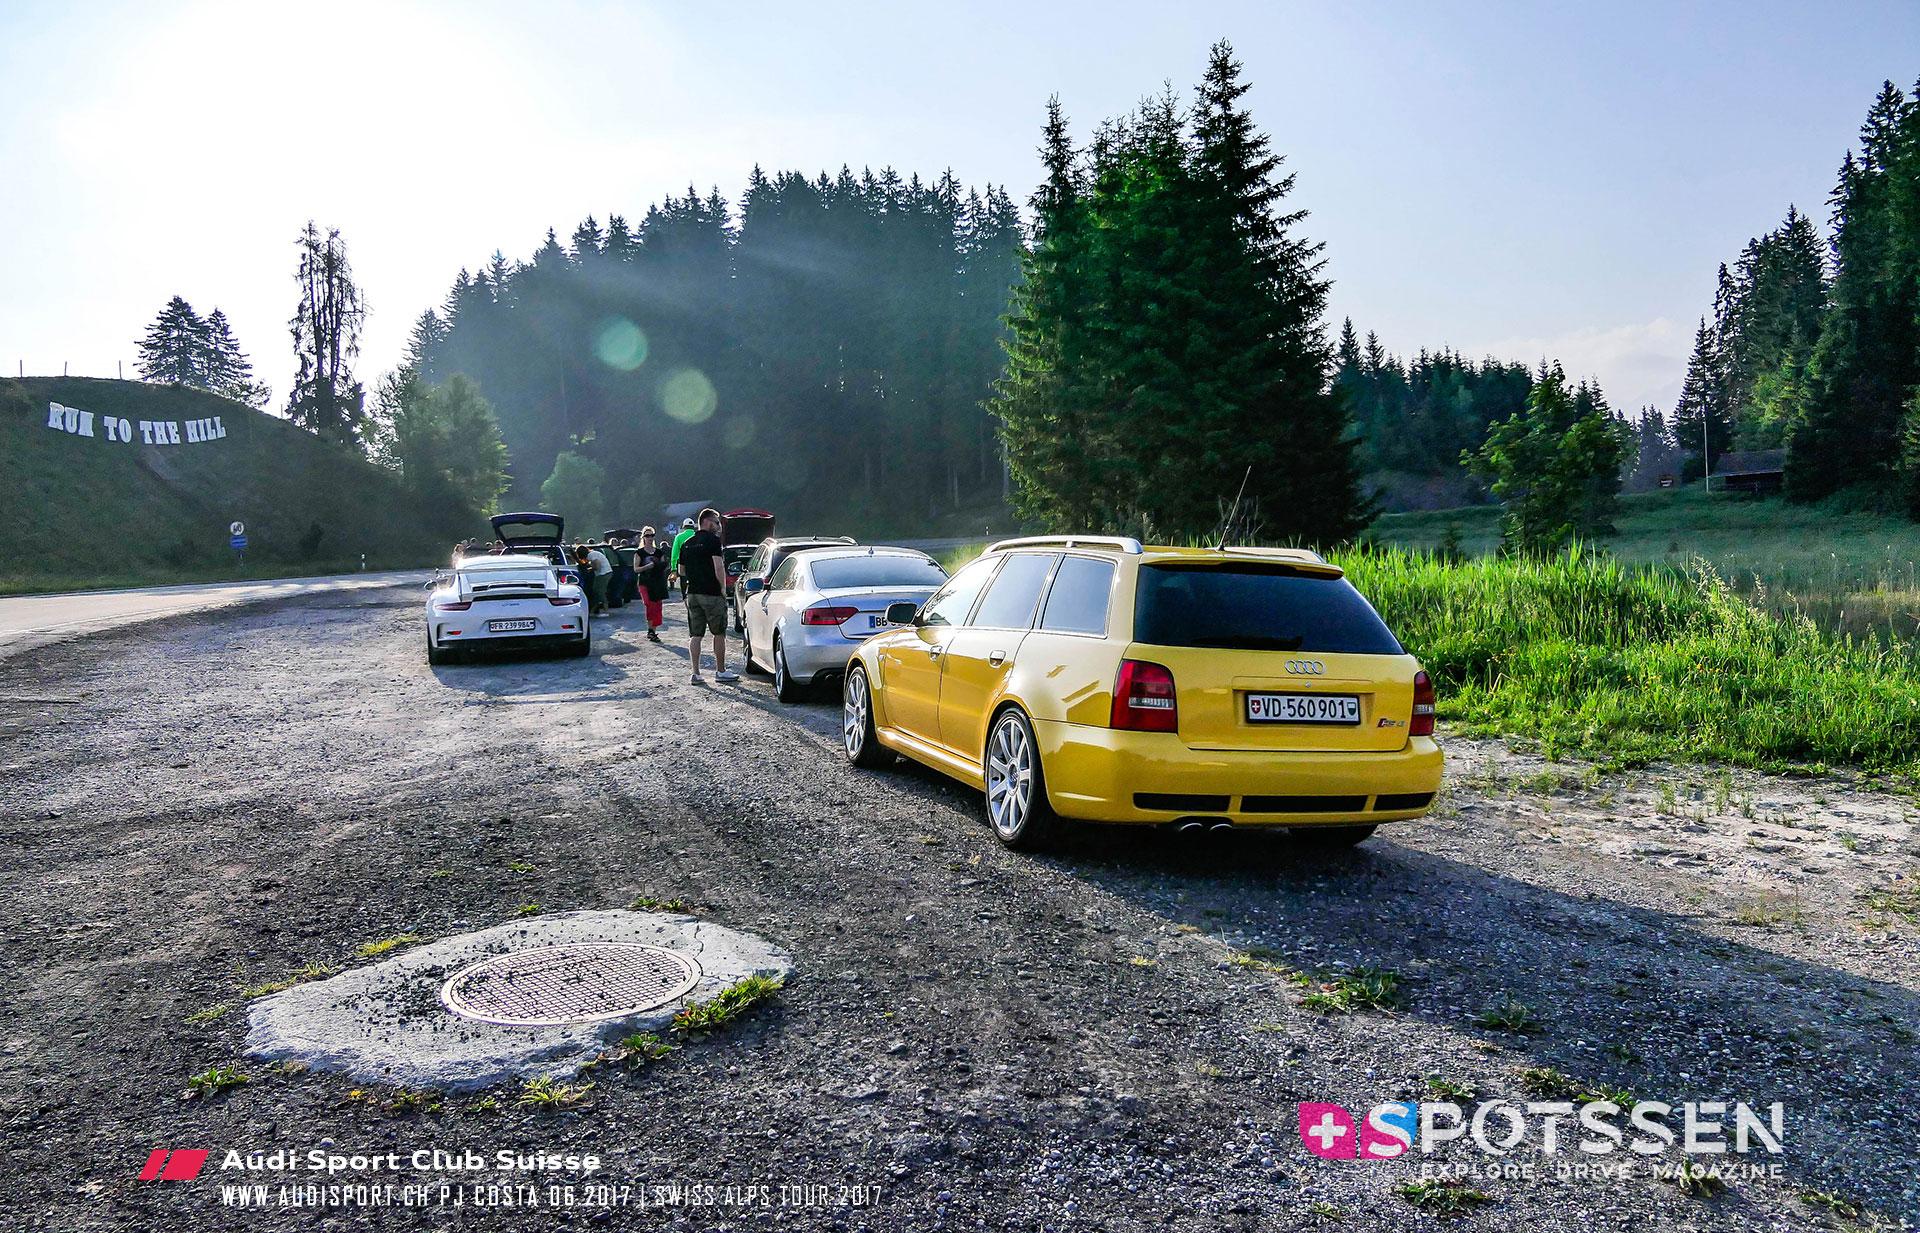 2017, ascs, swiss alps tour